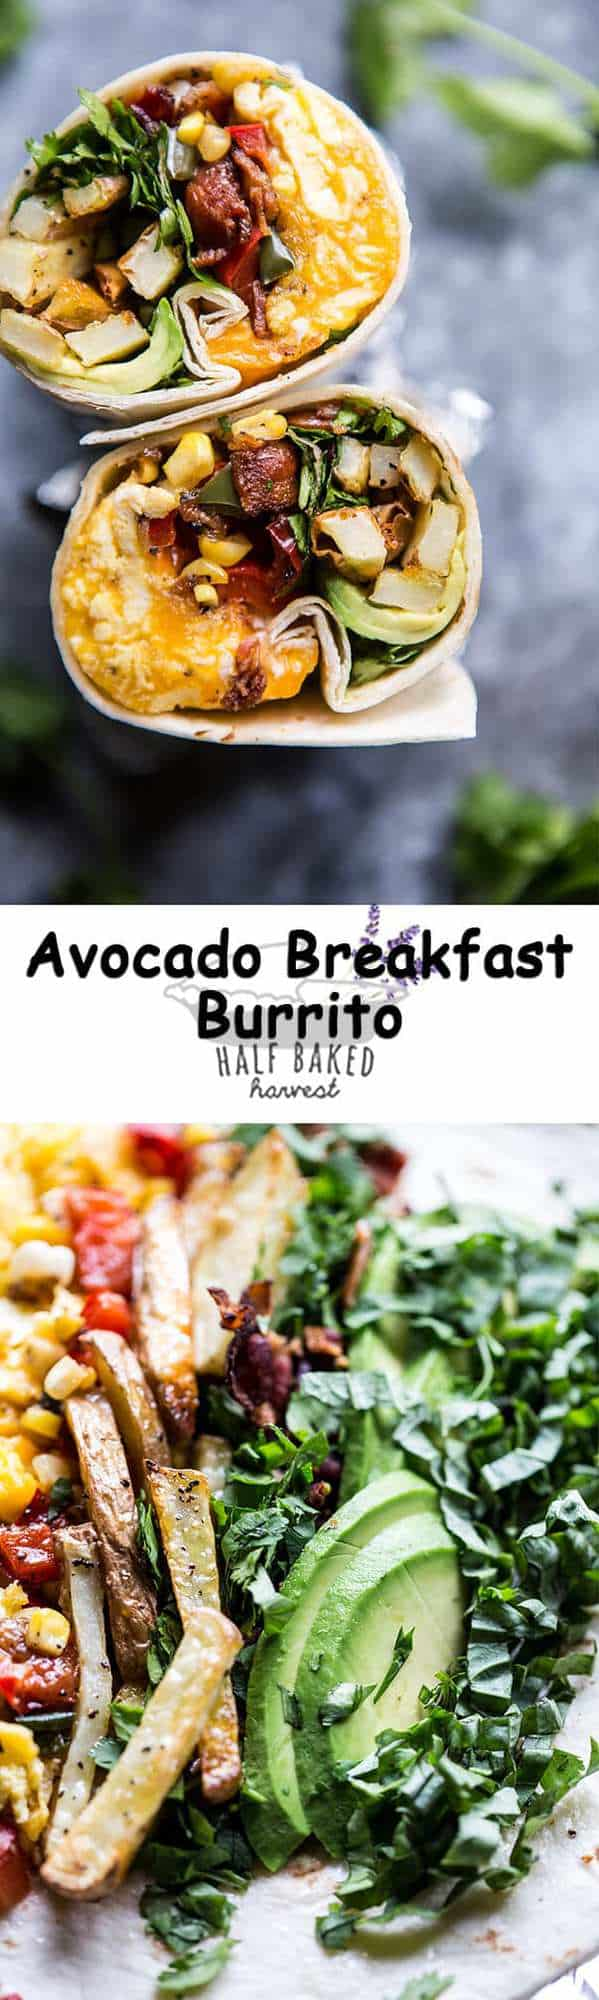 Avocado Breakfast Burrito | halfbakedharvest.com @hbharvest